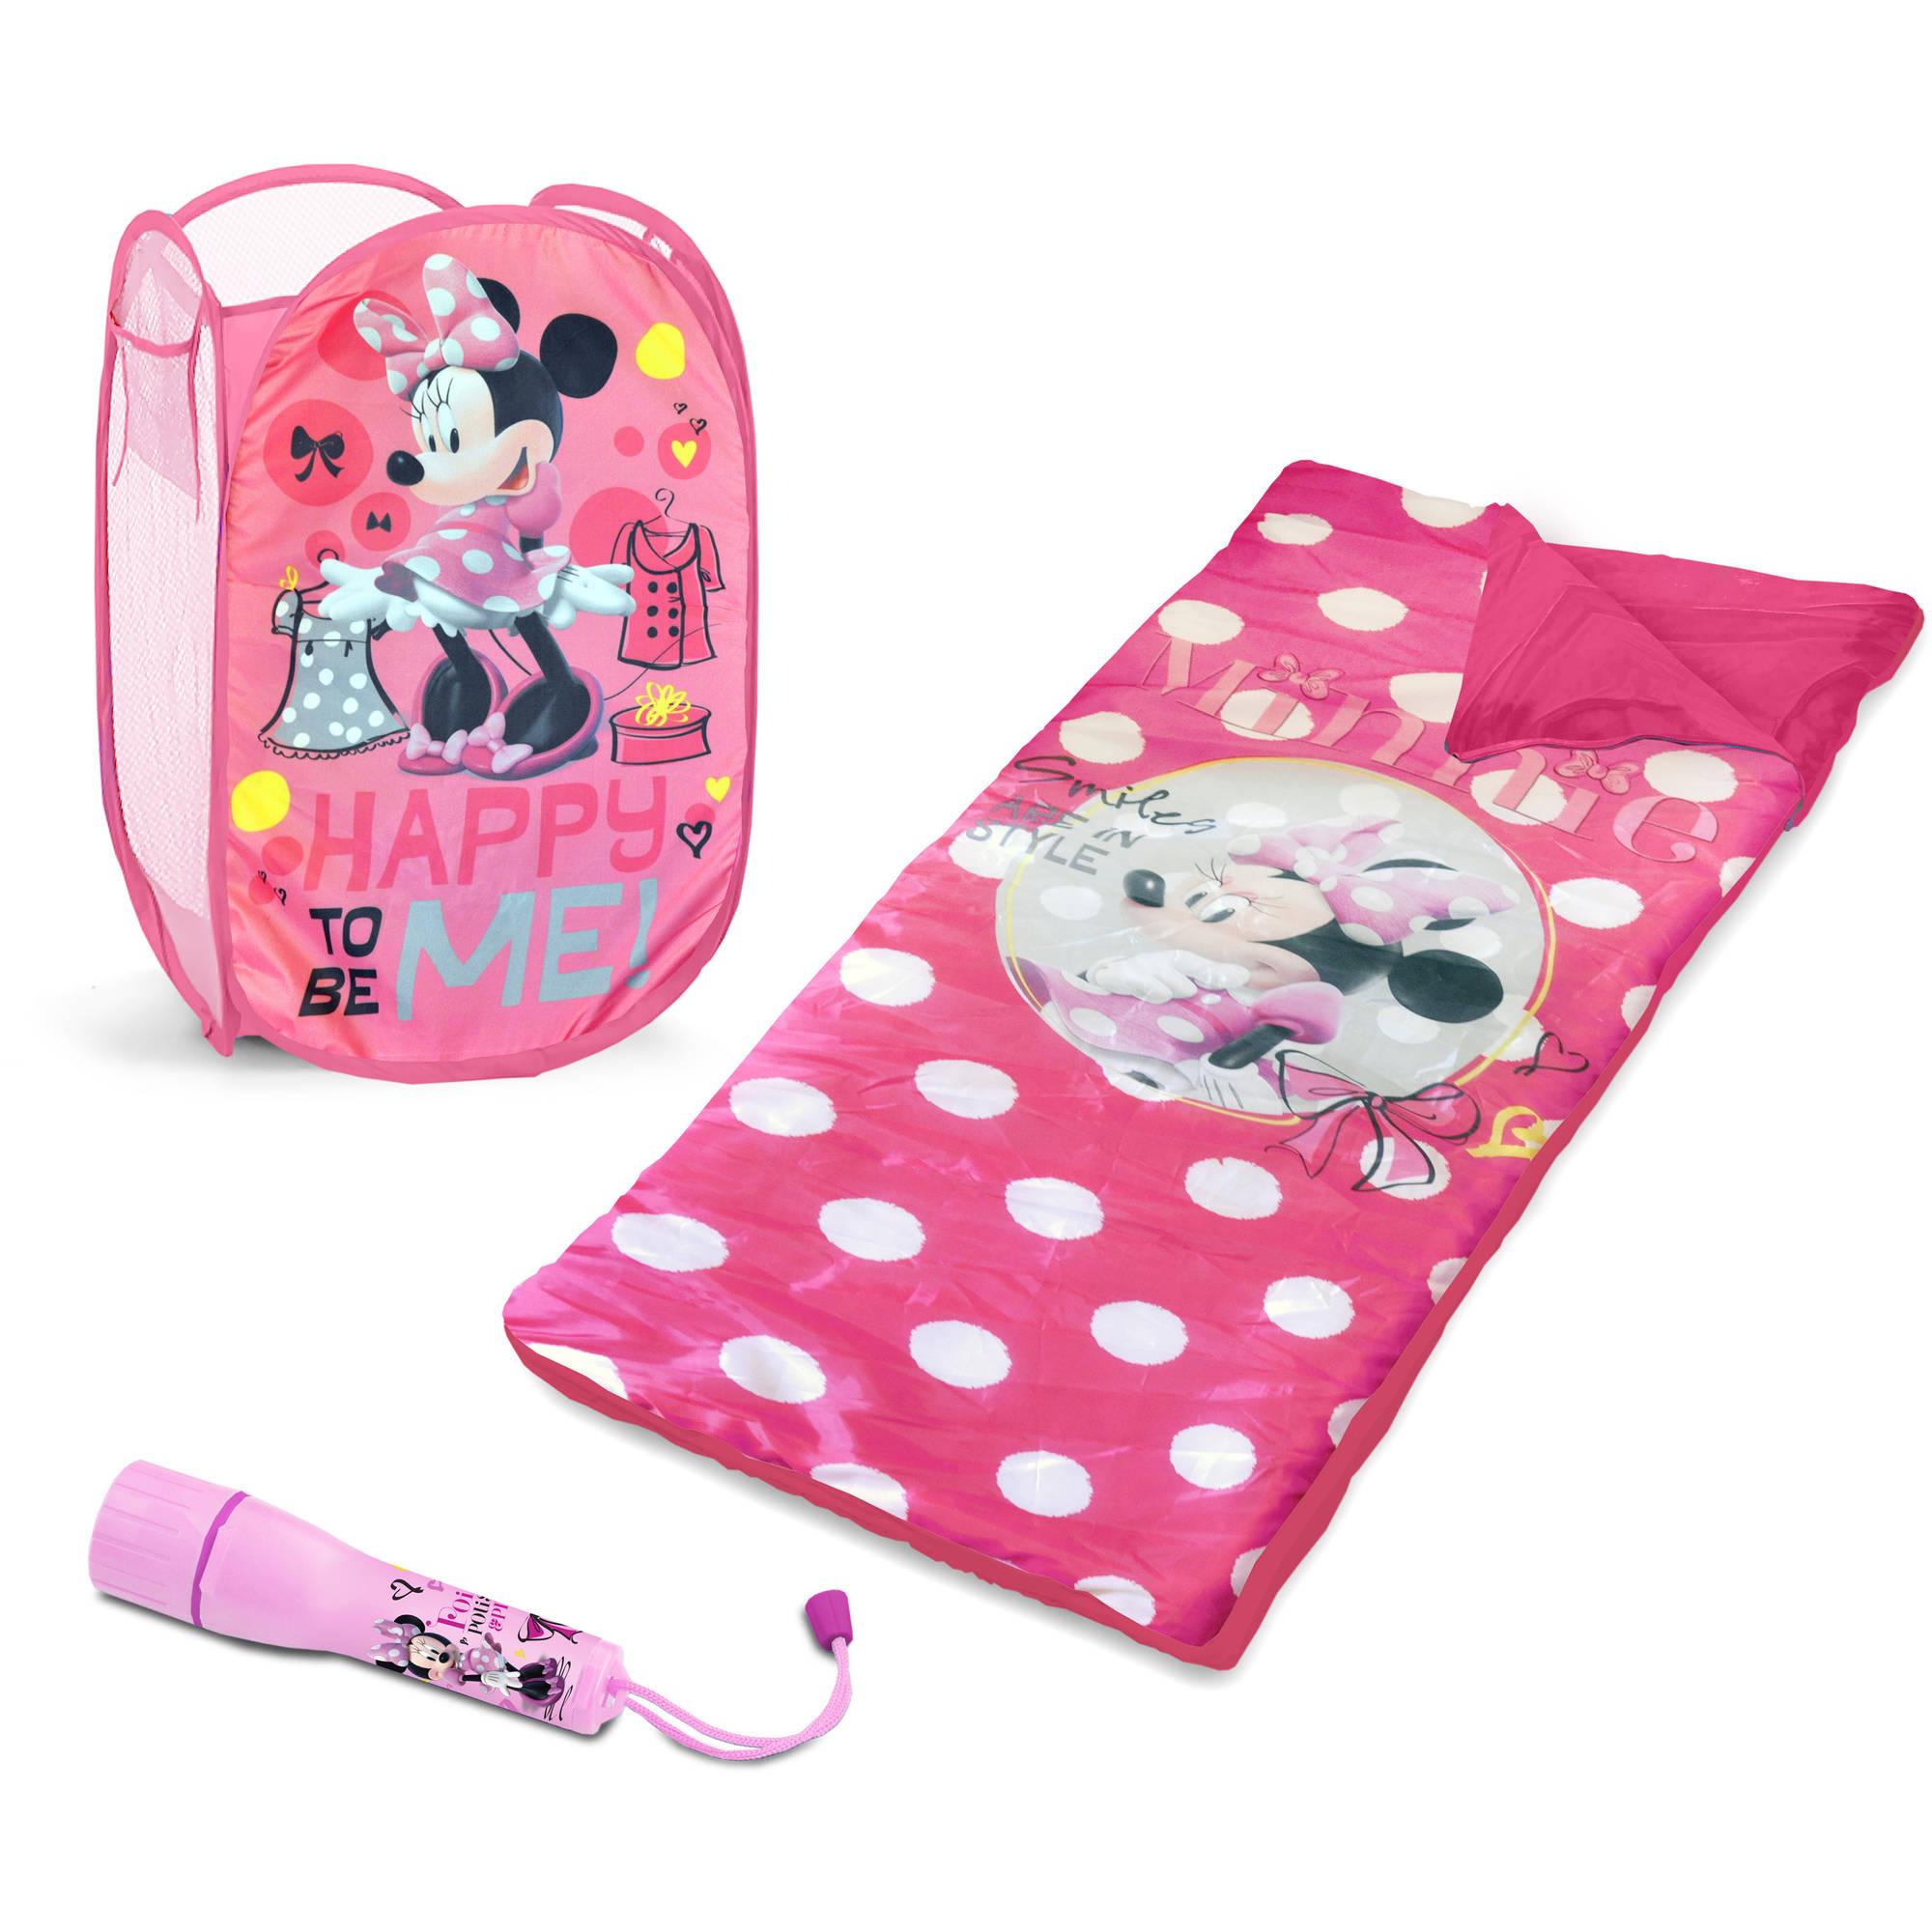 Disney Minnie Mouse Sleepover Set with BONUS Hamper